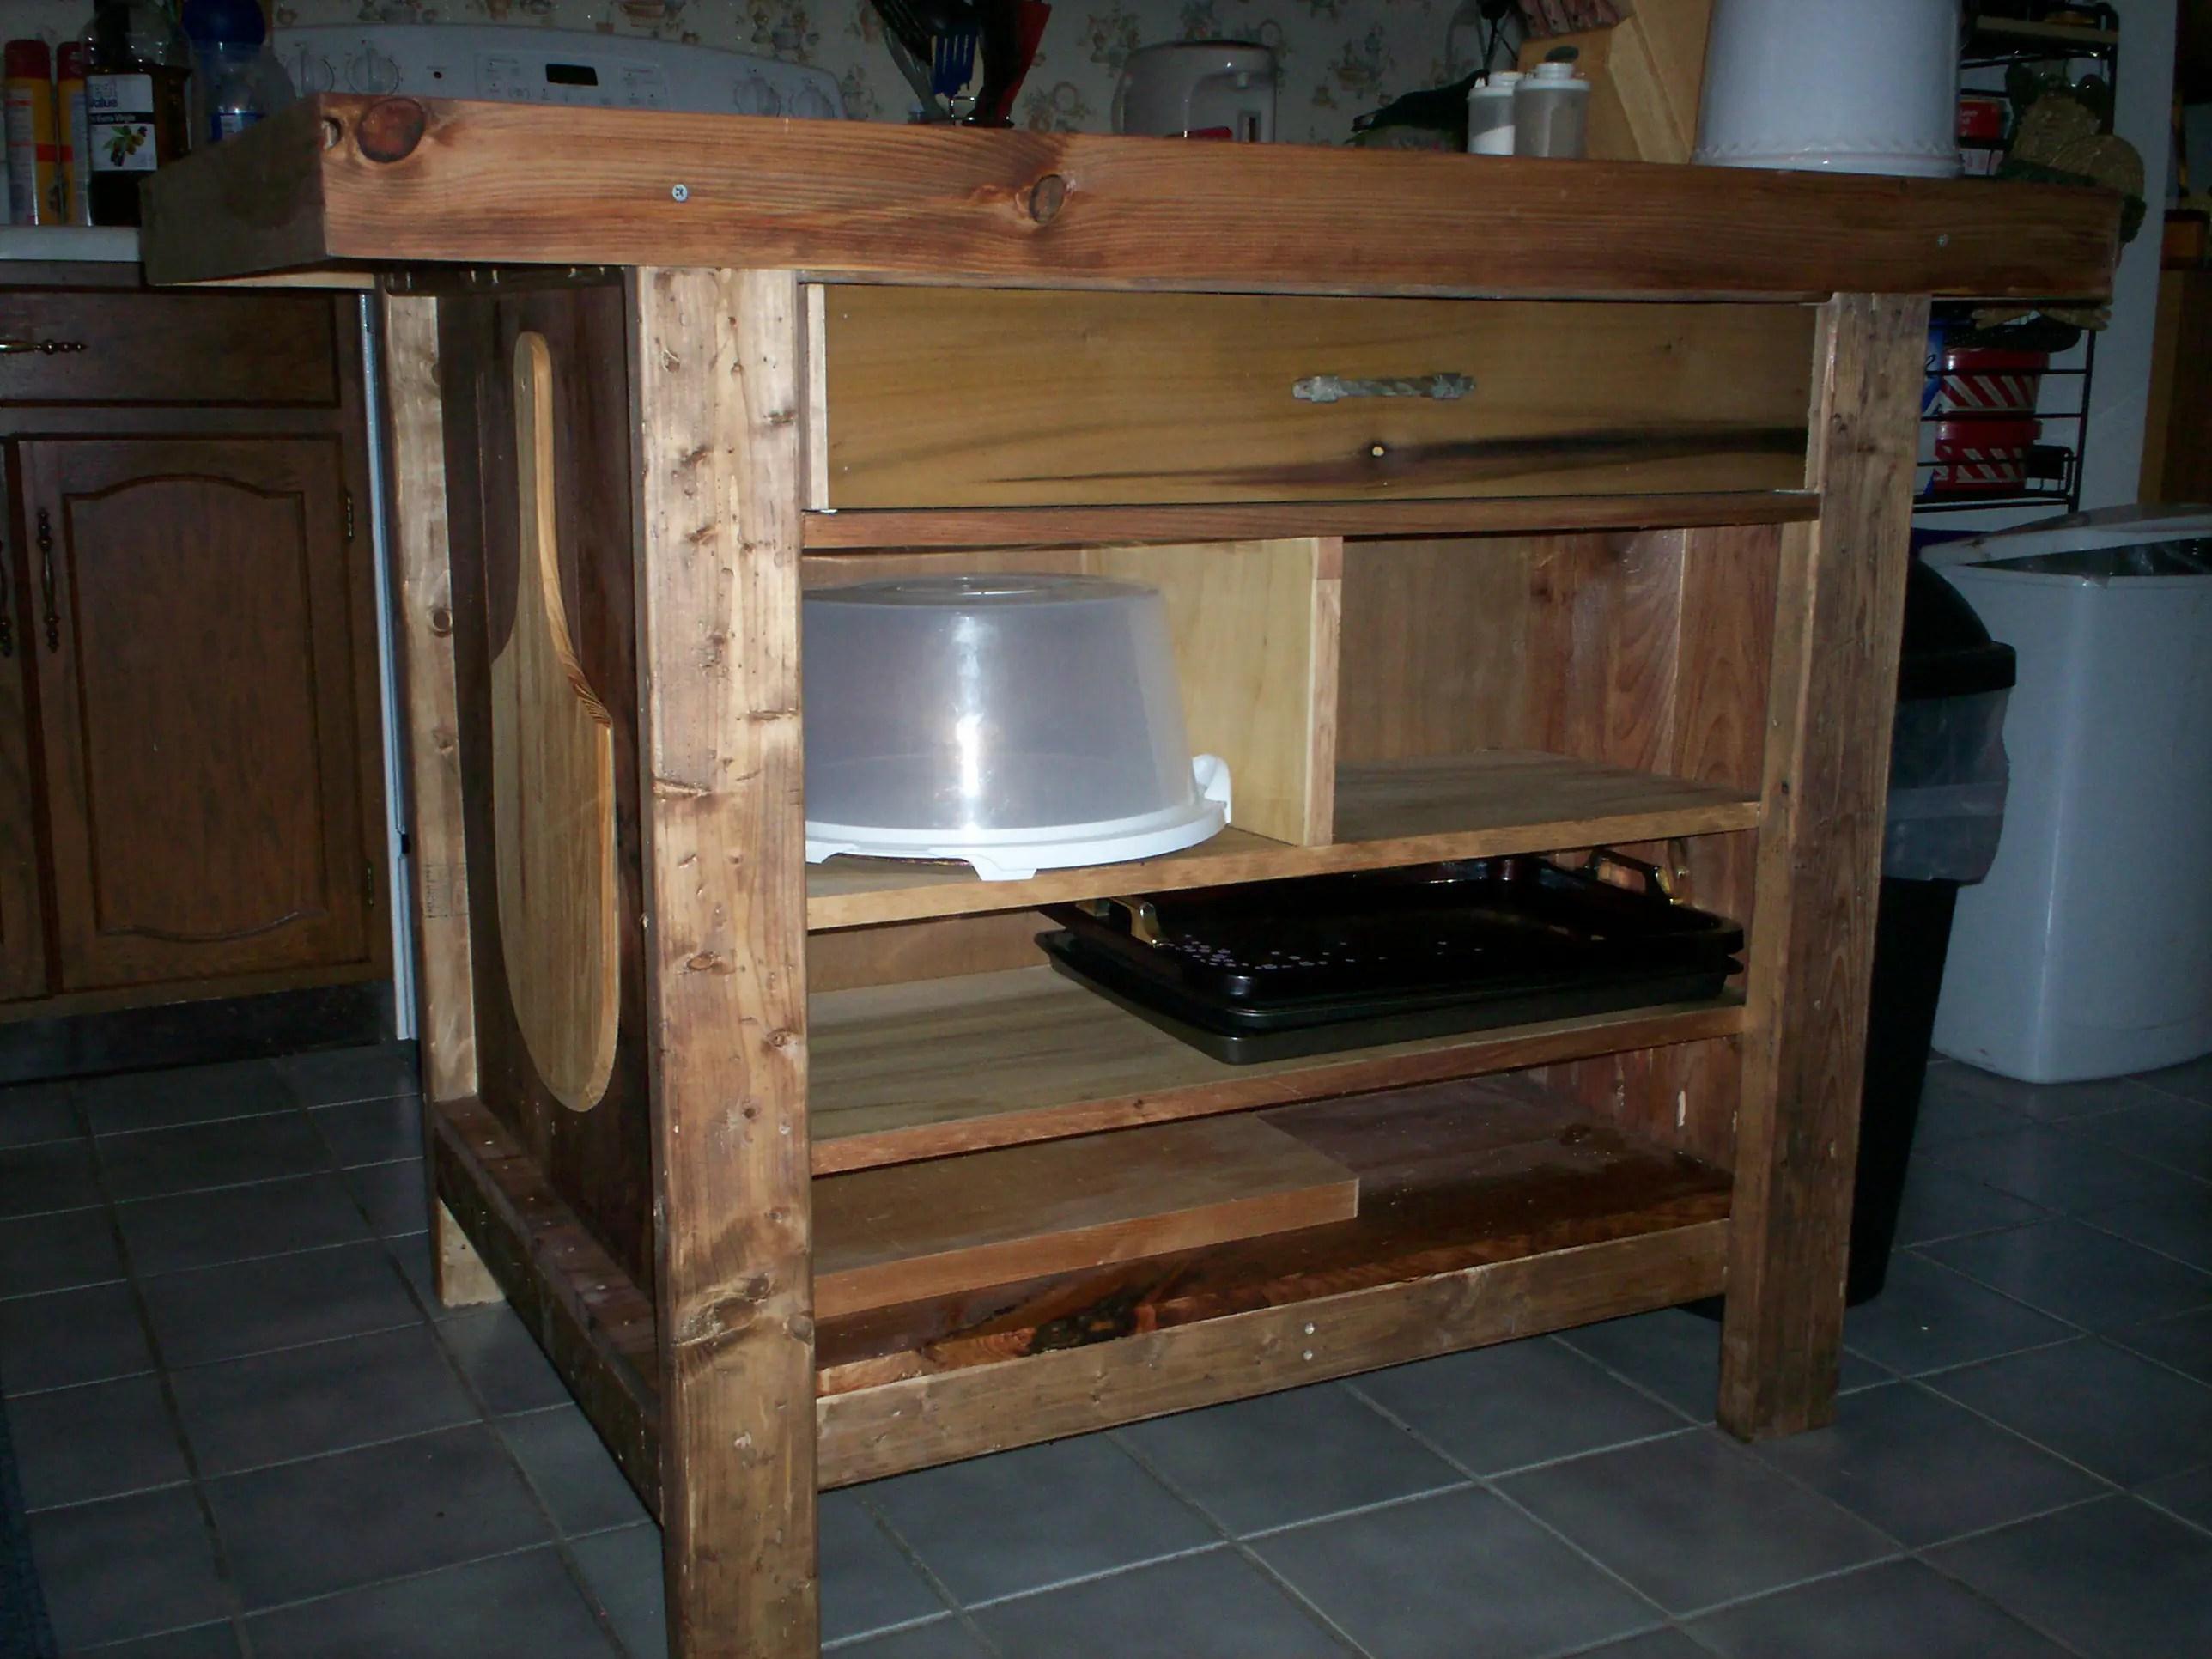 Guyu0027s Fabulous Napa Style Inspired Kitchen Island100_6309